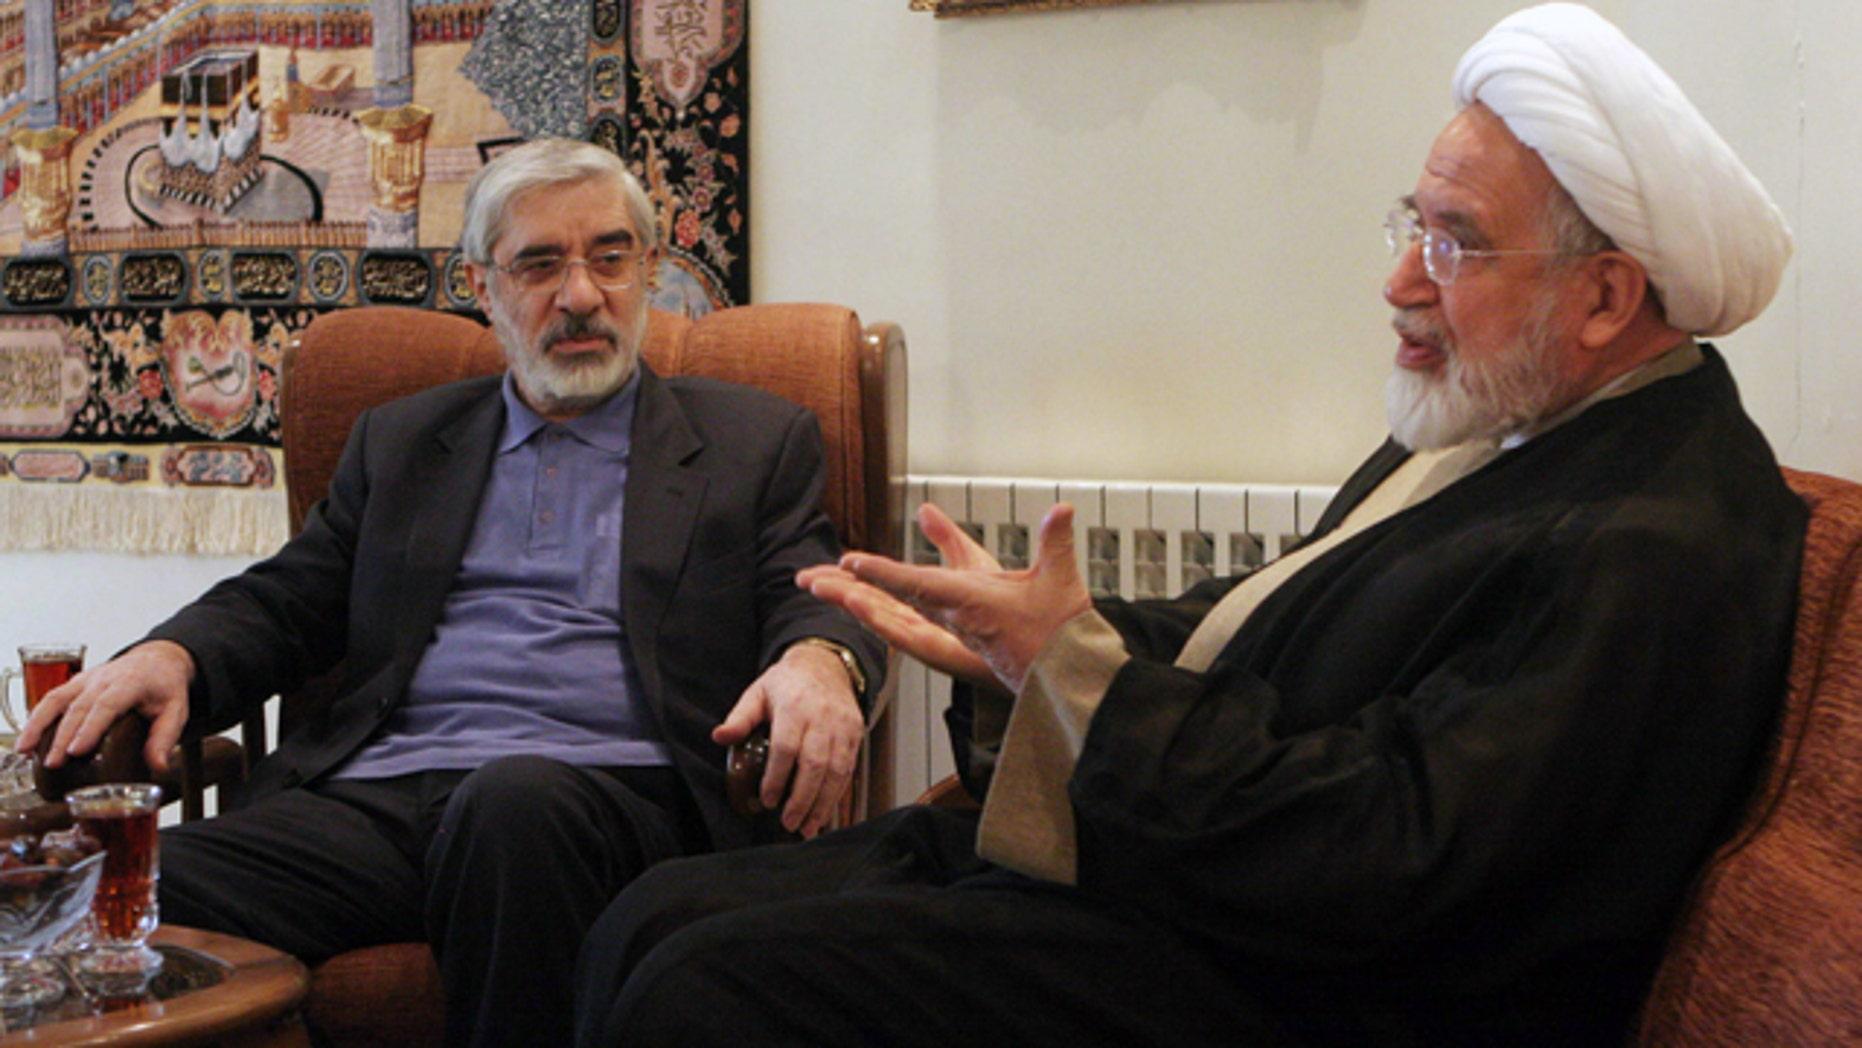 In this Saturday, Oct. 10, 2009, file photo, leaders of Iranian opposition, Mahdi Karroubi, right, and Mir Hossein Mousavi talk in Tehran, Iran.